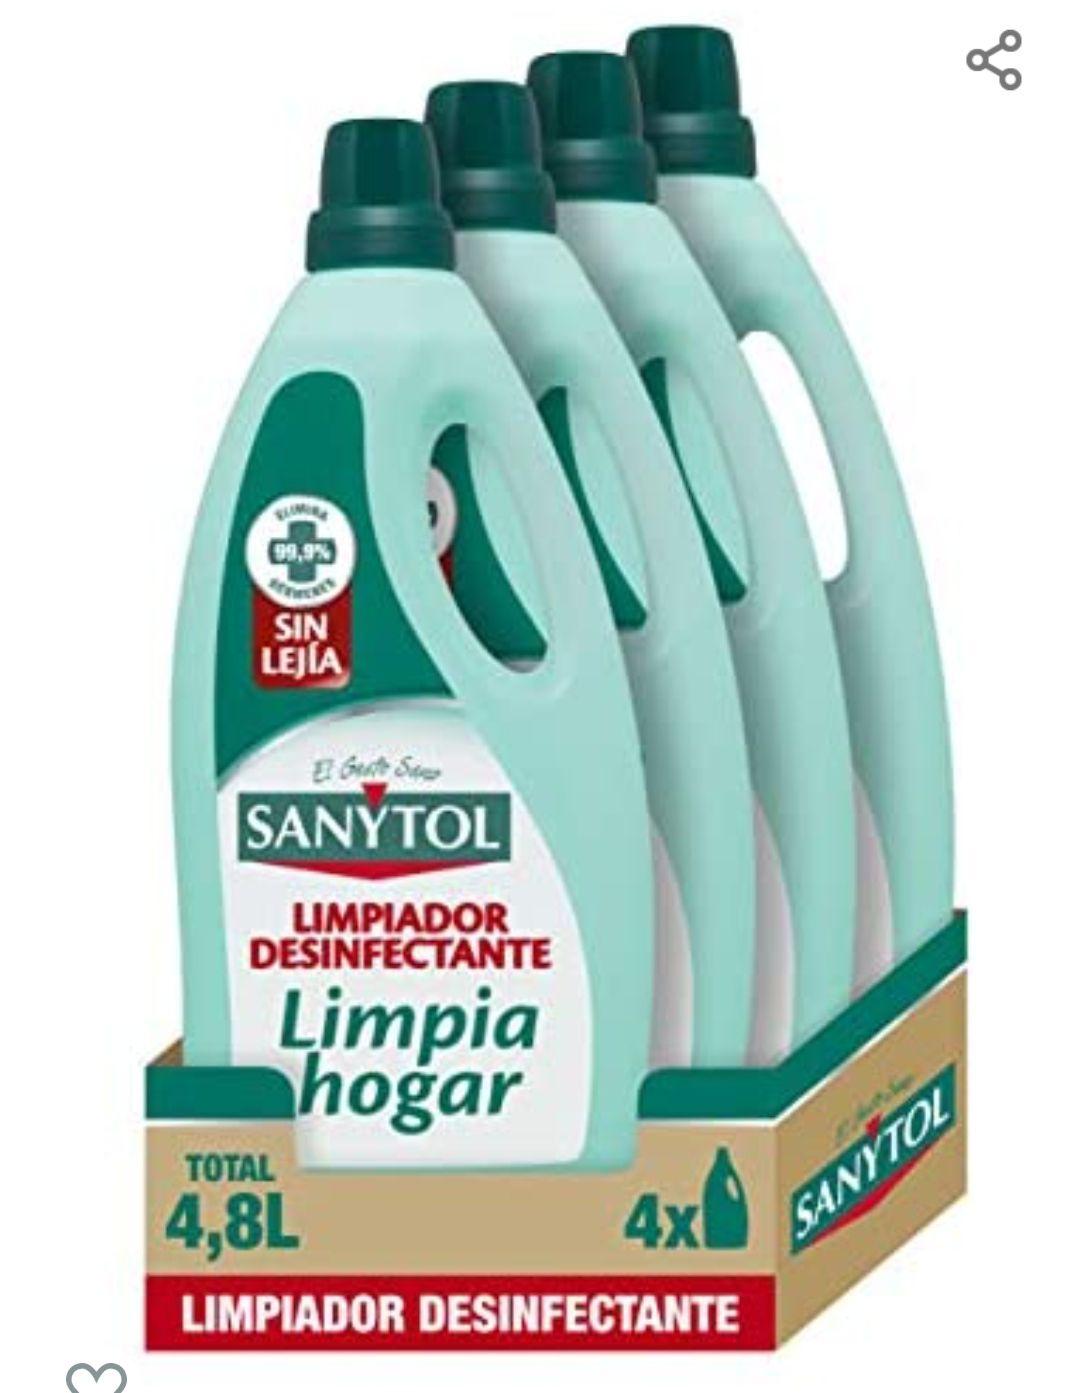 Sanytol – Botella desinfectante limpiahogar, elimina bacterias, hongos y virus sin Lejía, perfume eucaliptus – Pack de 4 x 1200 ml